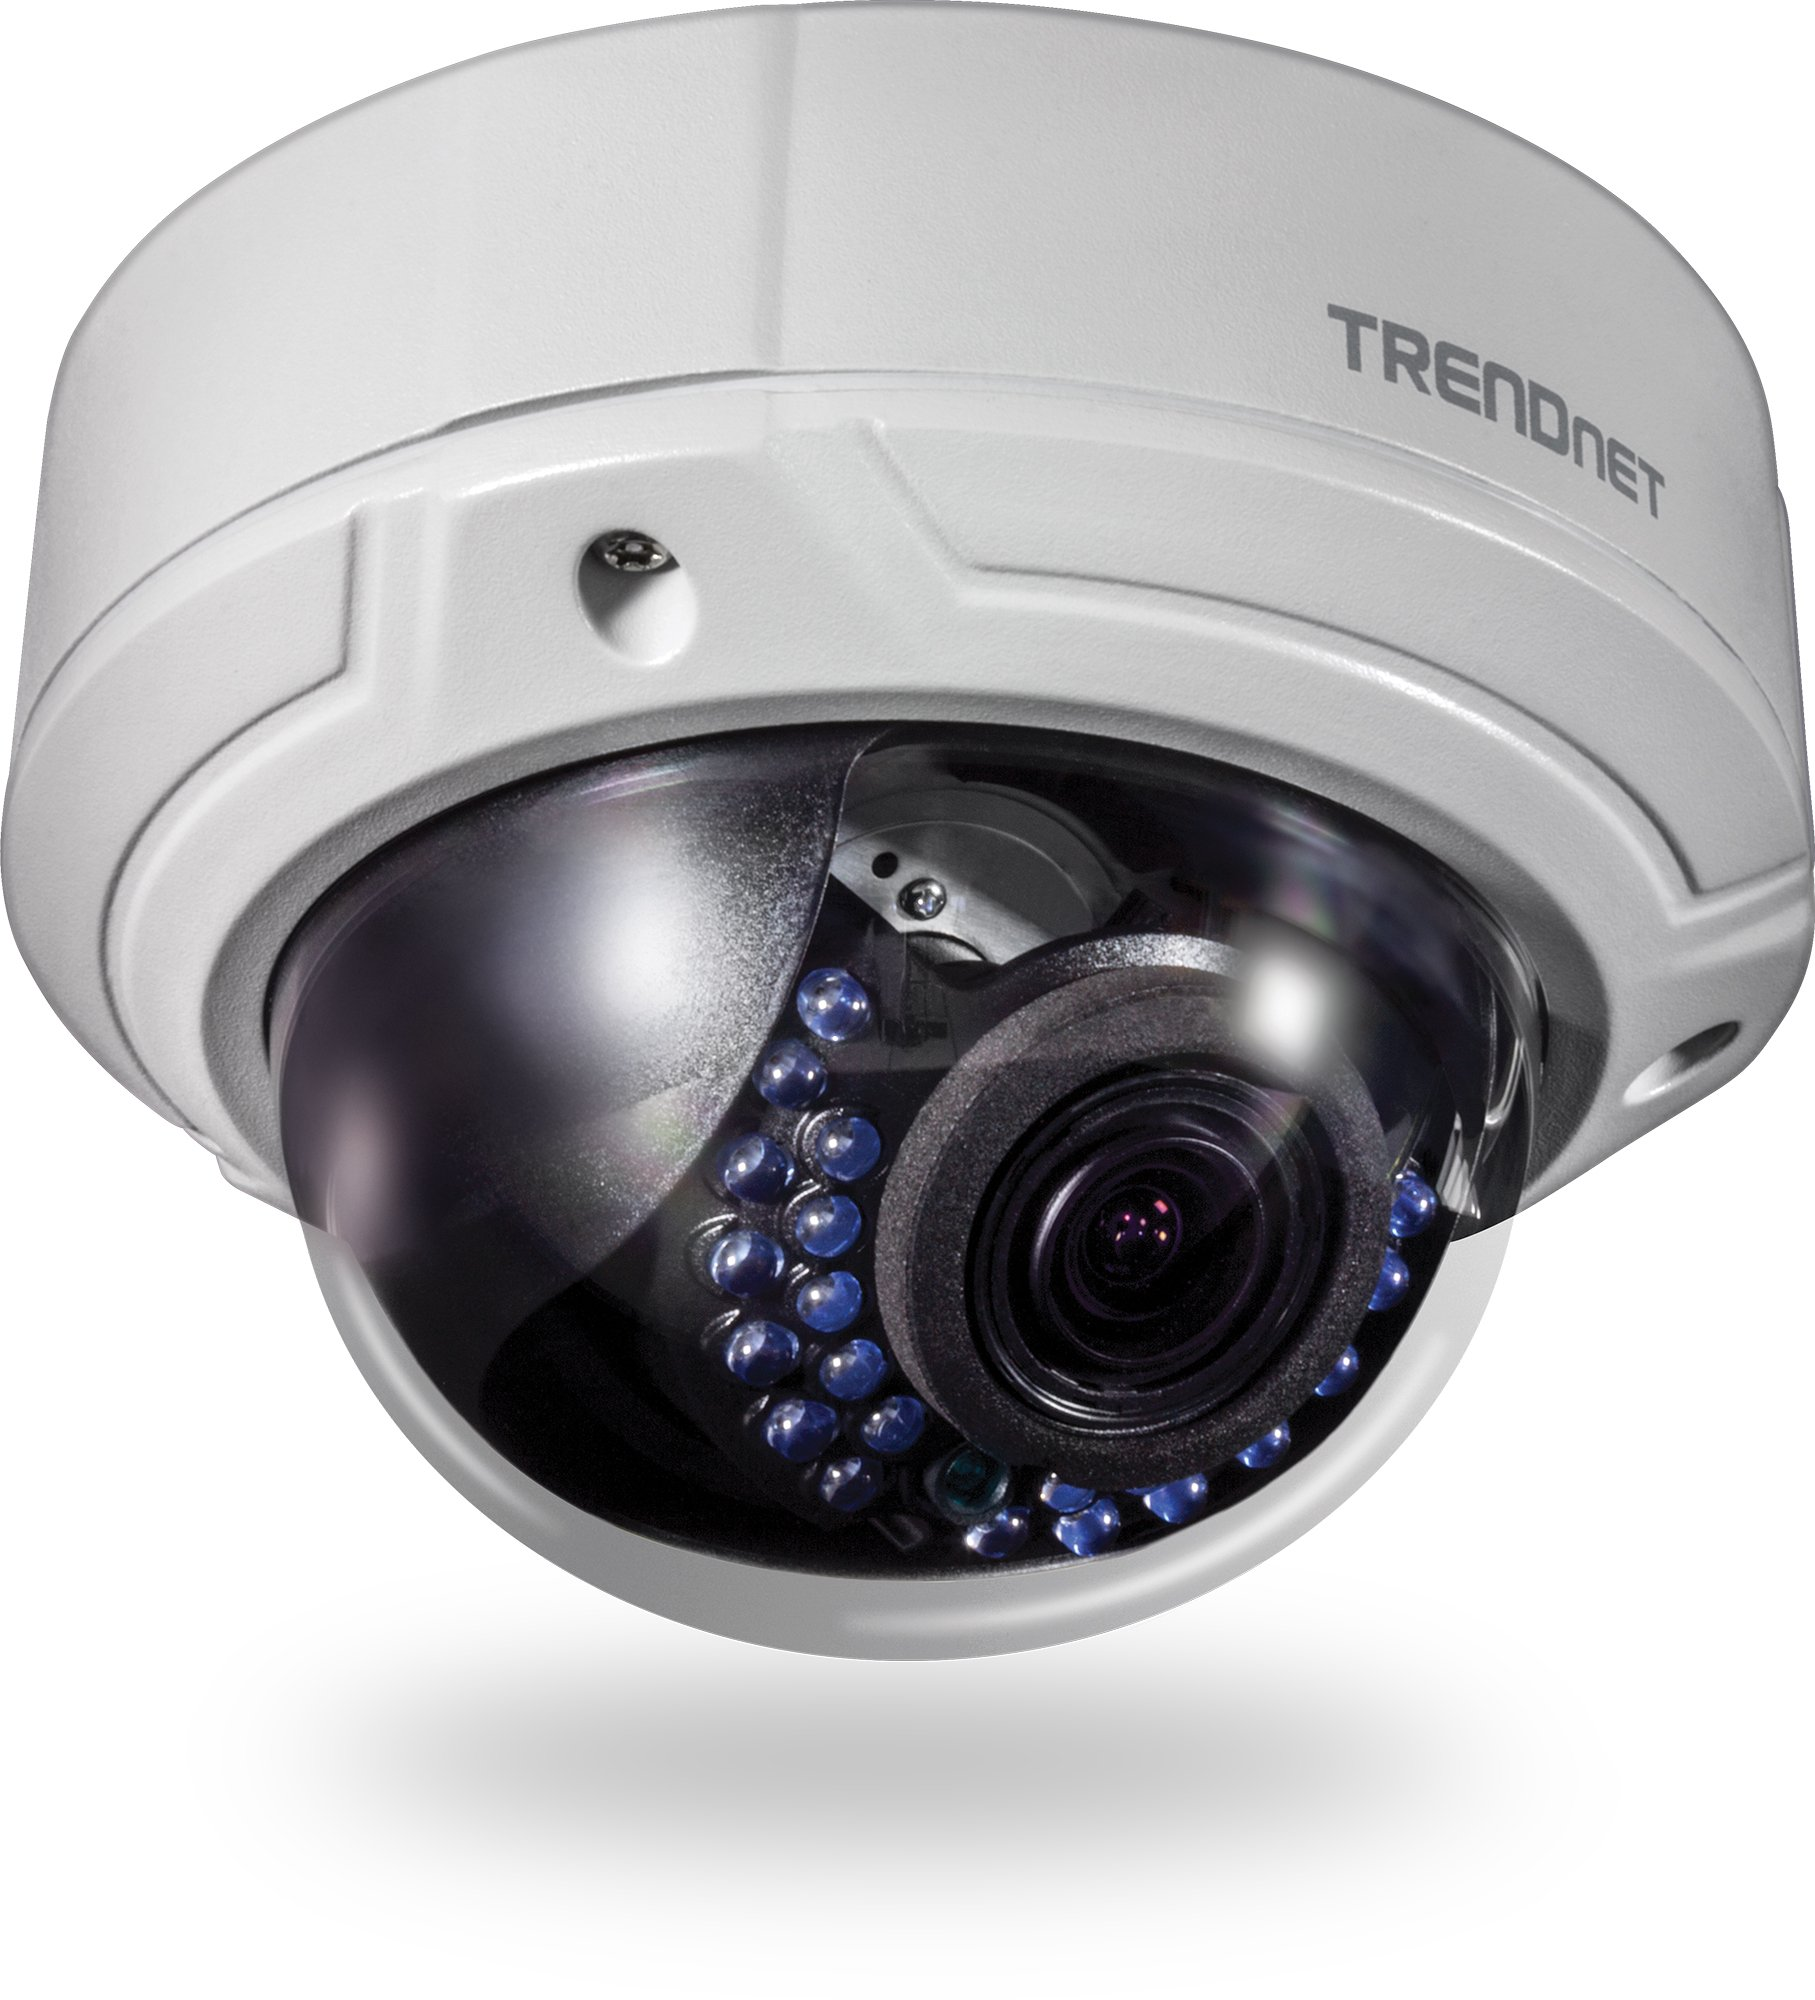 TRENDnet Indoor/Outdoor 2MP 1080p Varifocal PoE IR Dome Network Camera, IP66 Rated Housing, Adjustable Lens, Digital WDR, IK10 Vandal Resistant, ONVIF, IPv6, TV-IP341PI